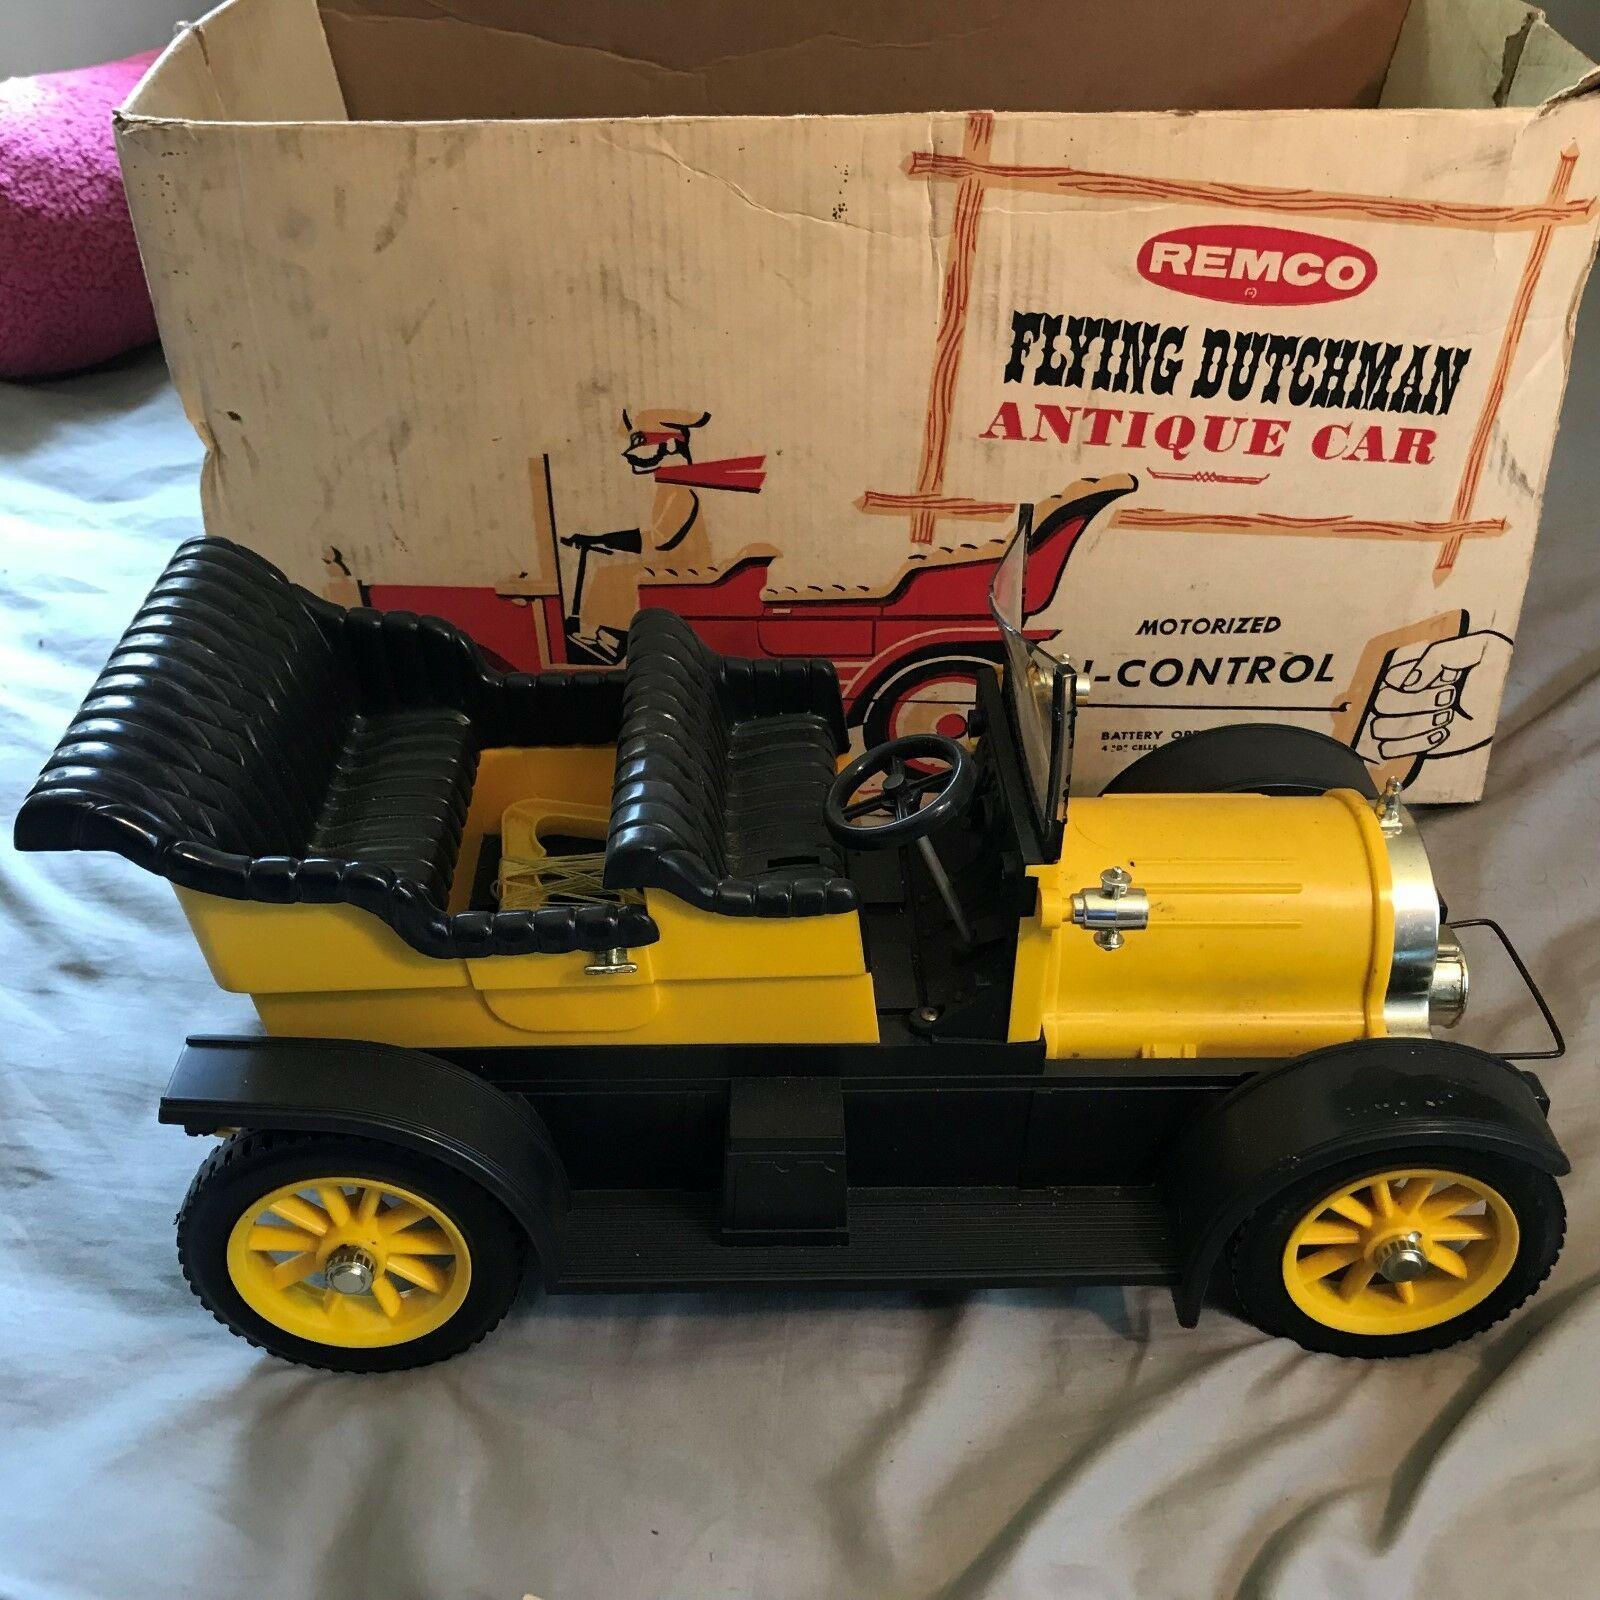 1960s Flying Dutchman Antique Car REMCO Motorized w/box